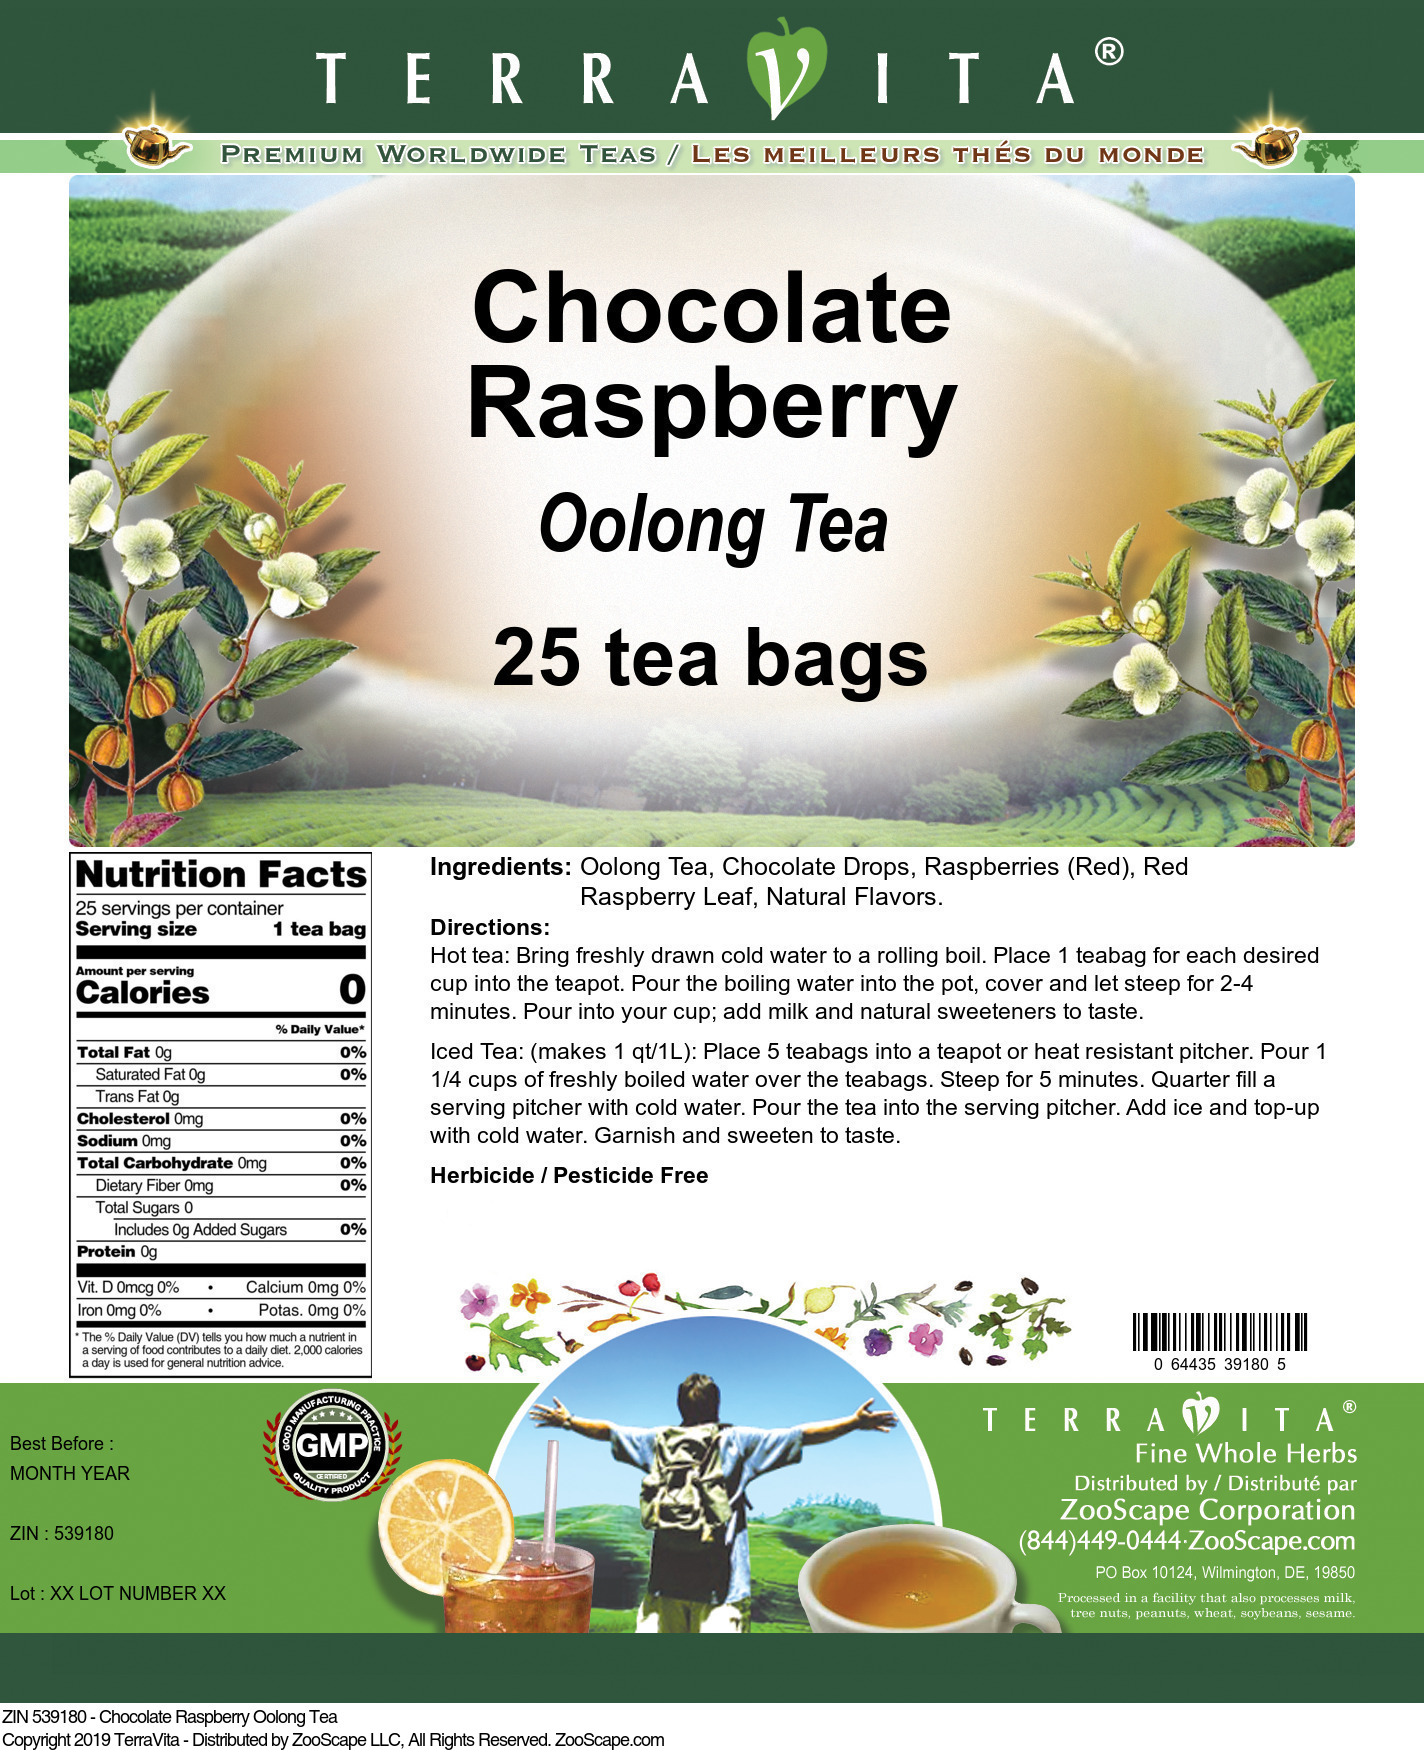 Chocolate Raspberry Oolong Tea